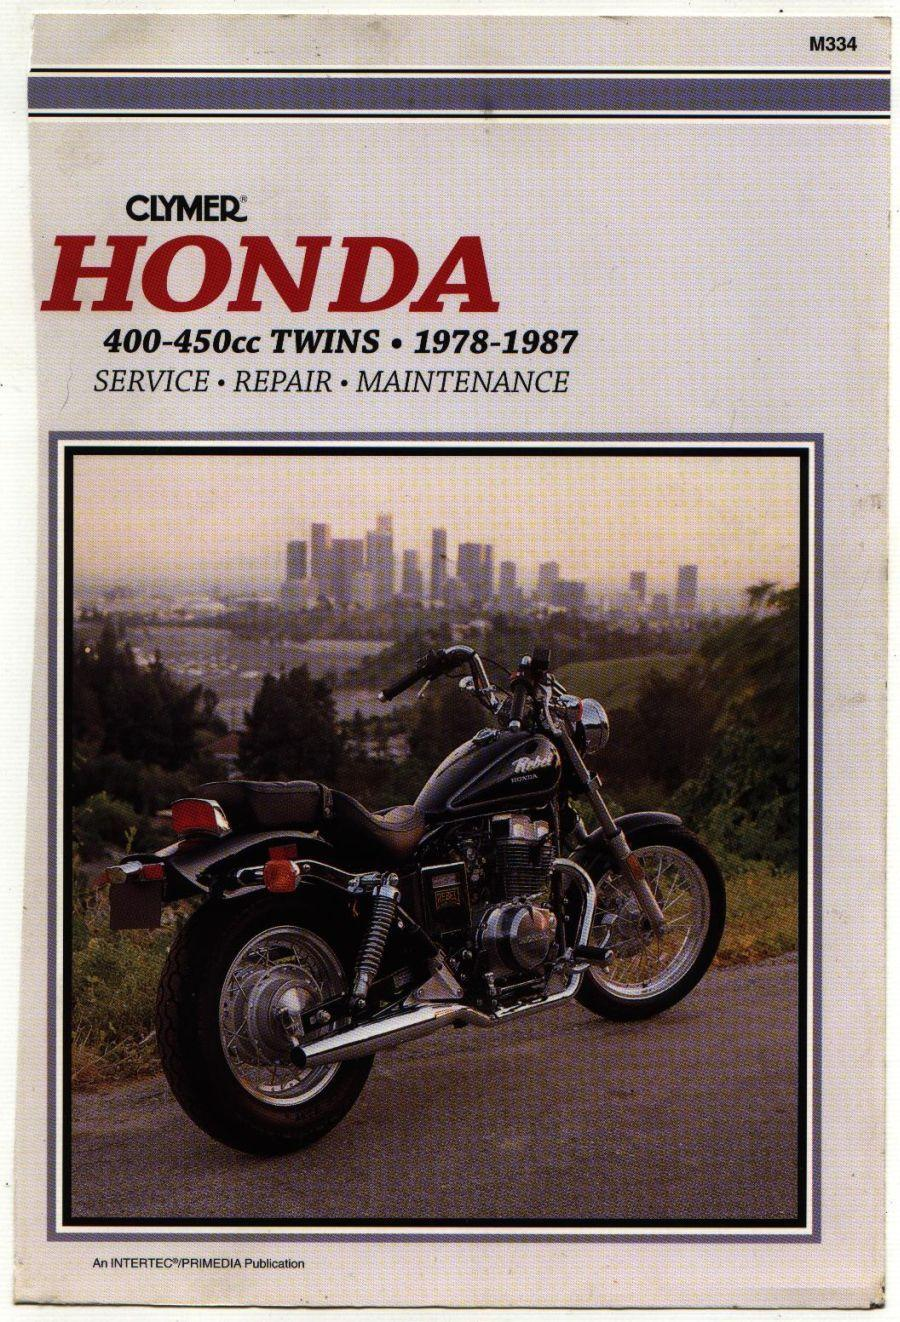 Clymer Honda 400&450 (1978-1987) Twins Workshop Manual